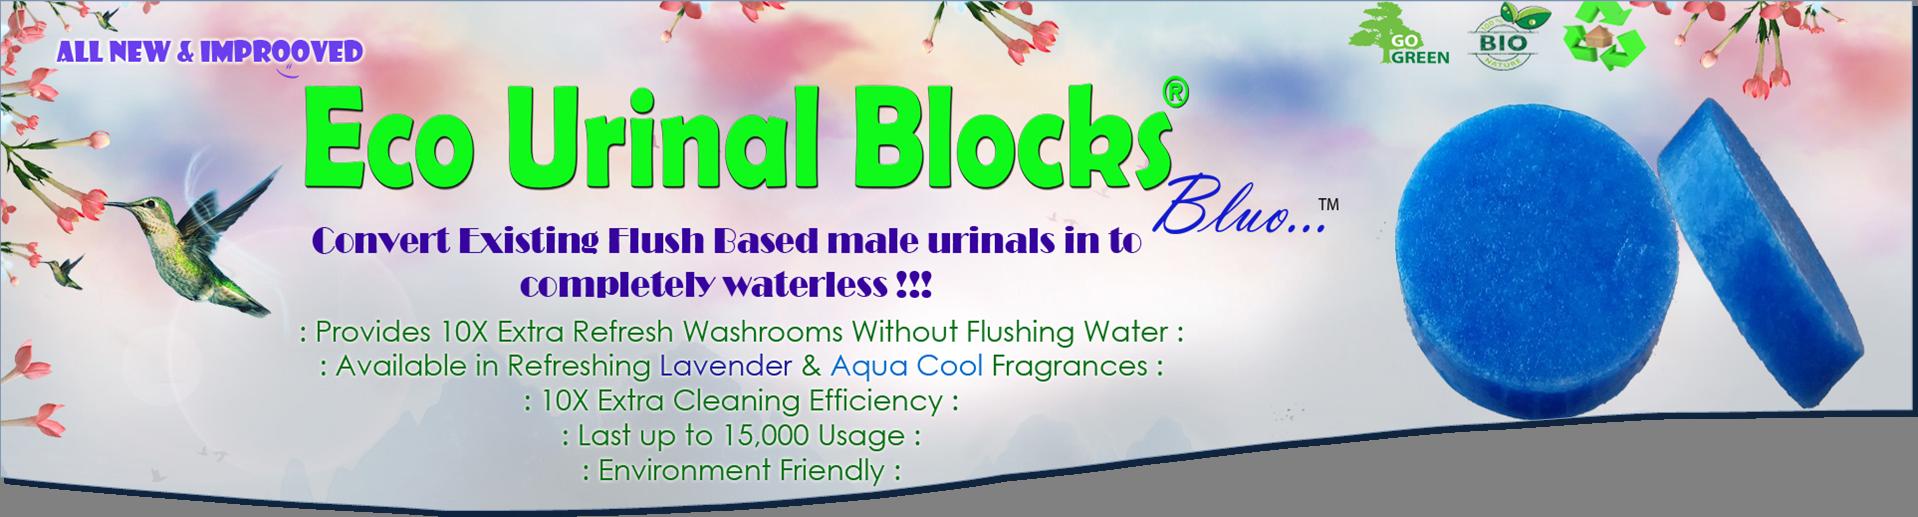 Eco-Bio Blocks : Eco Urinal Blocks? Bluo?, Bio Urinal Blocks, Biological Blocks, Bio ...